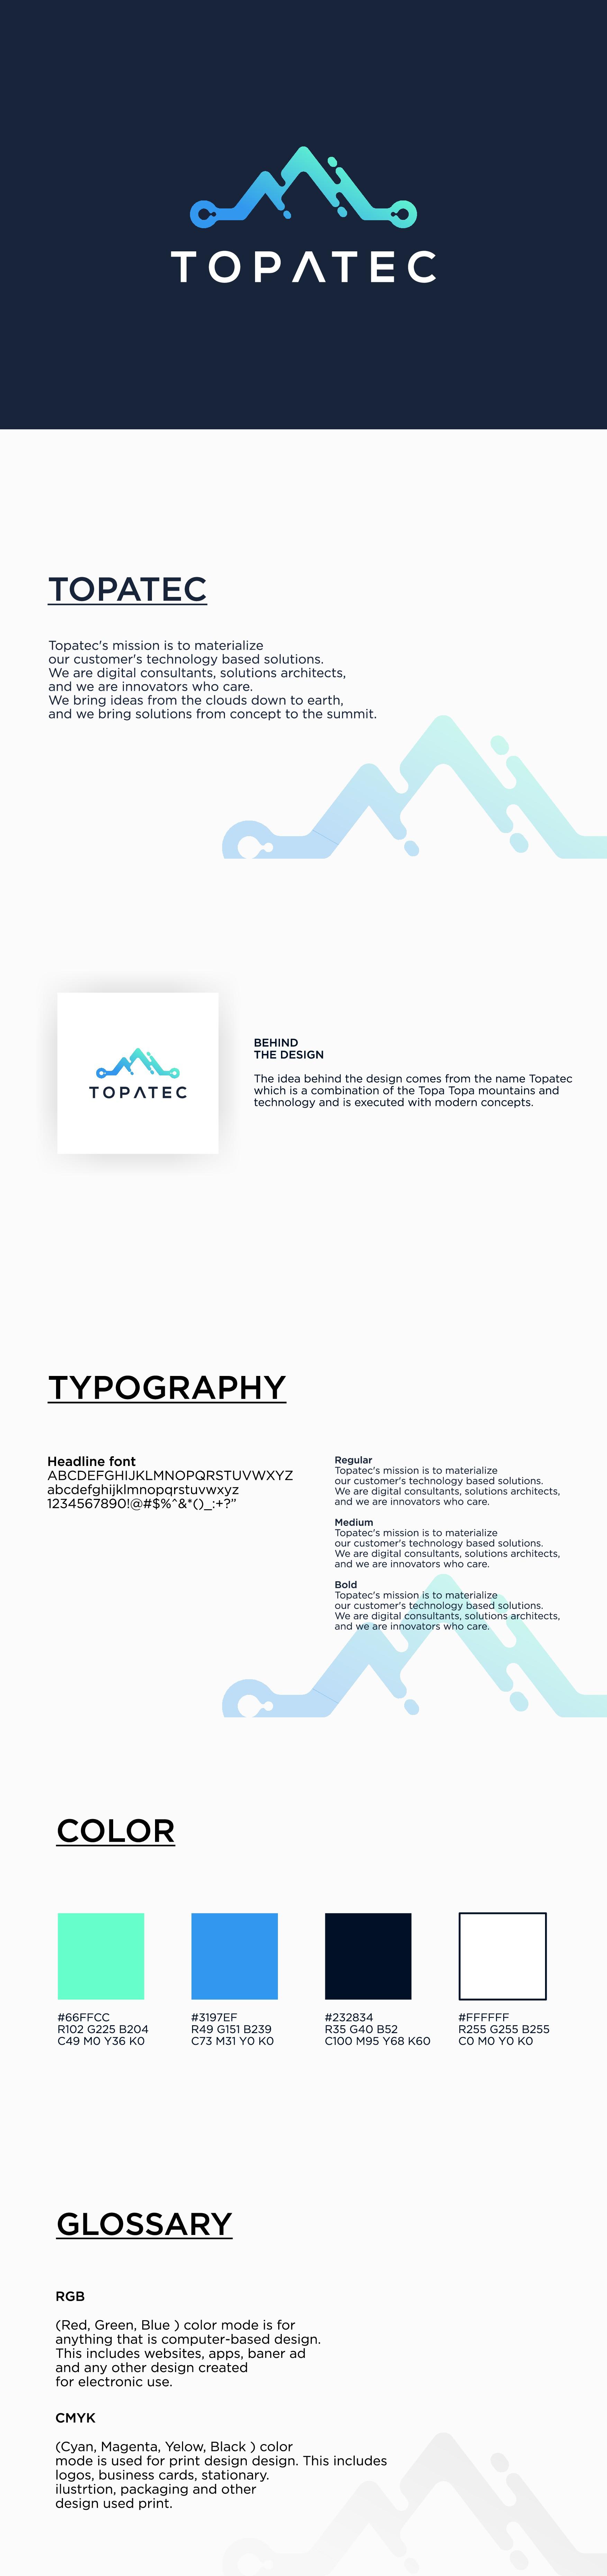 Topatec Branding